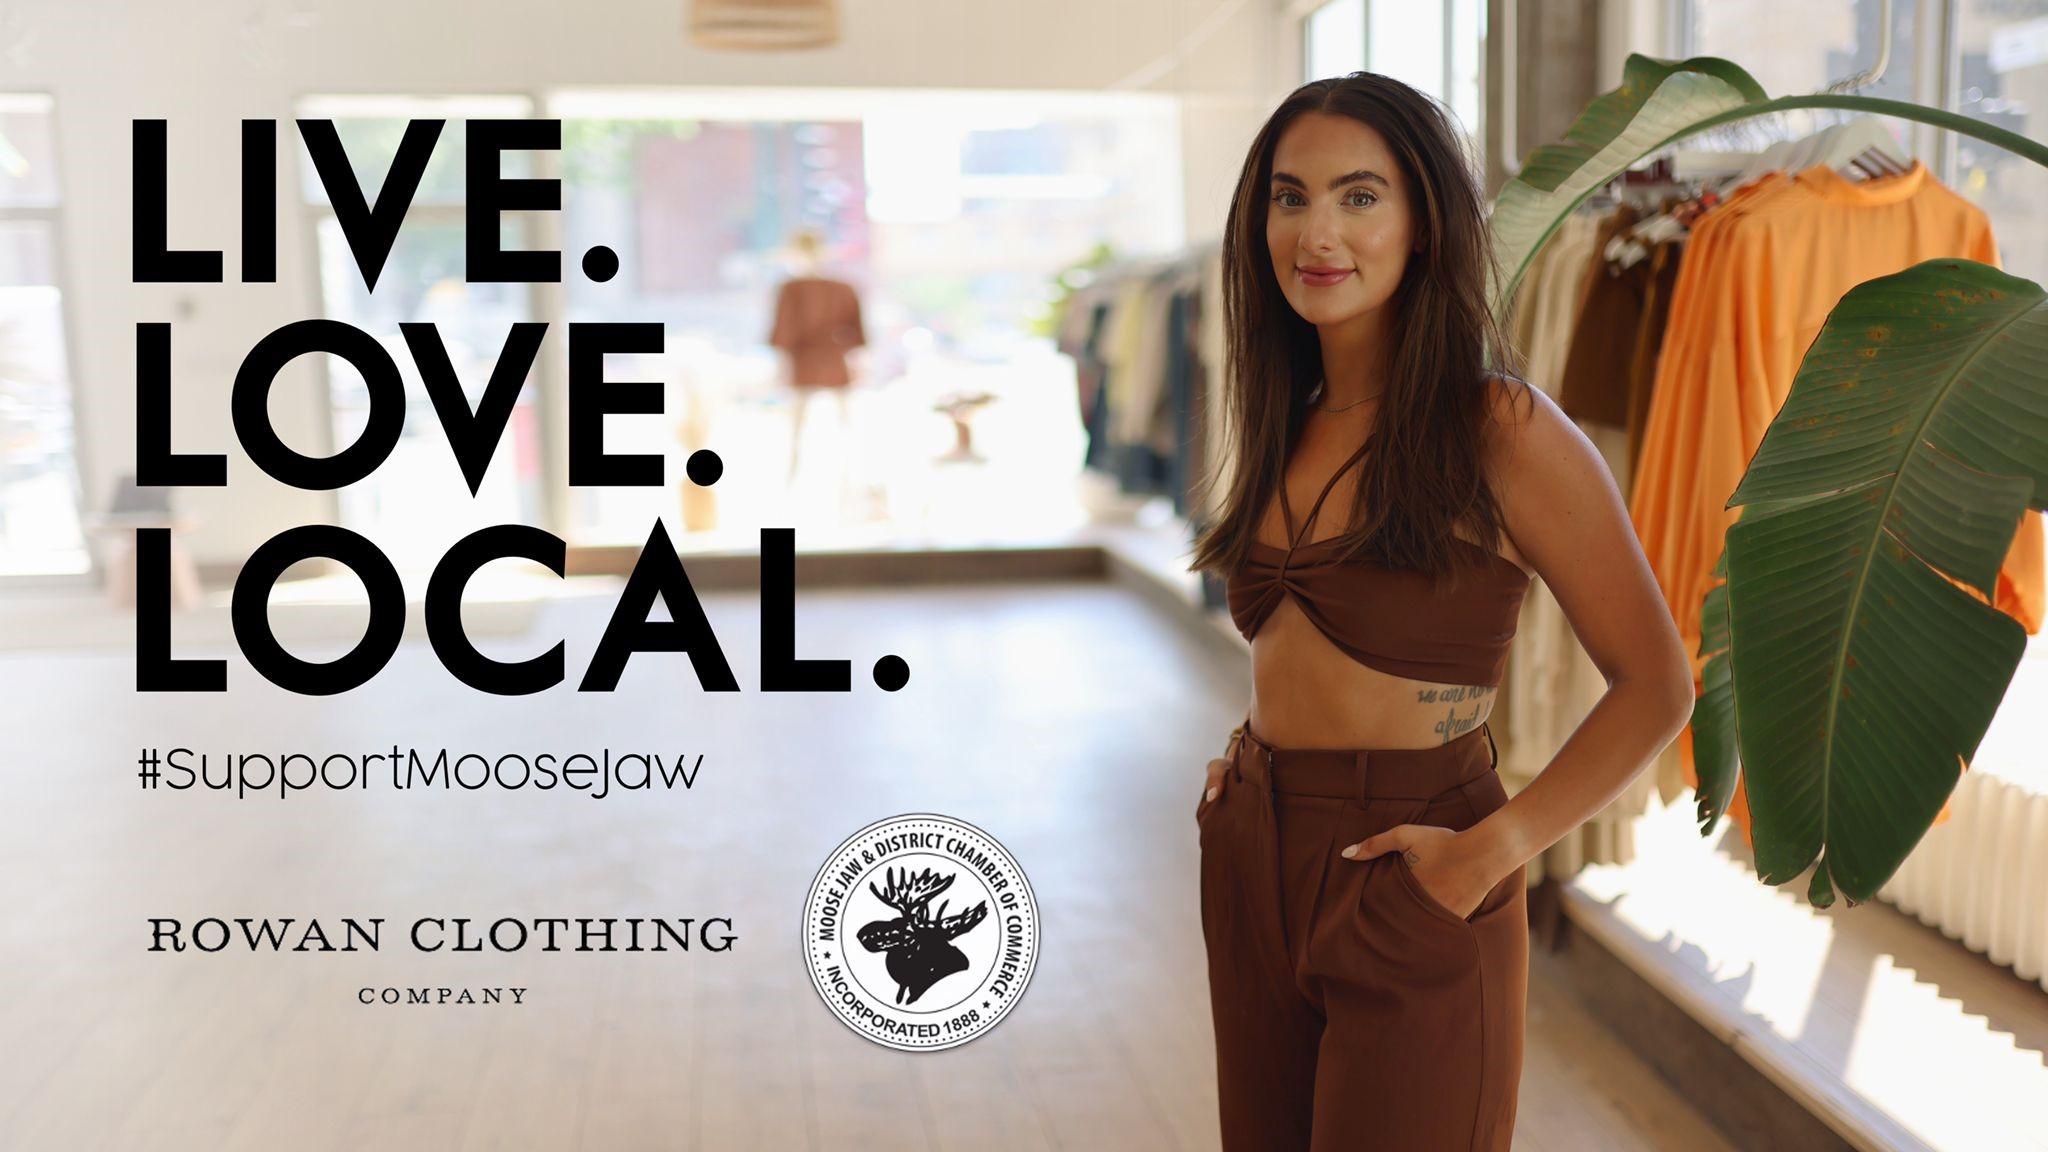 Rowan Clothing